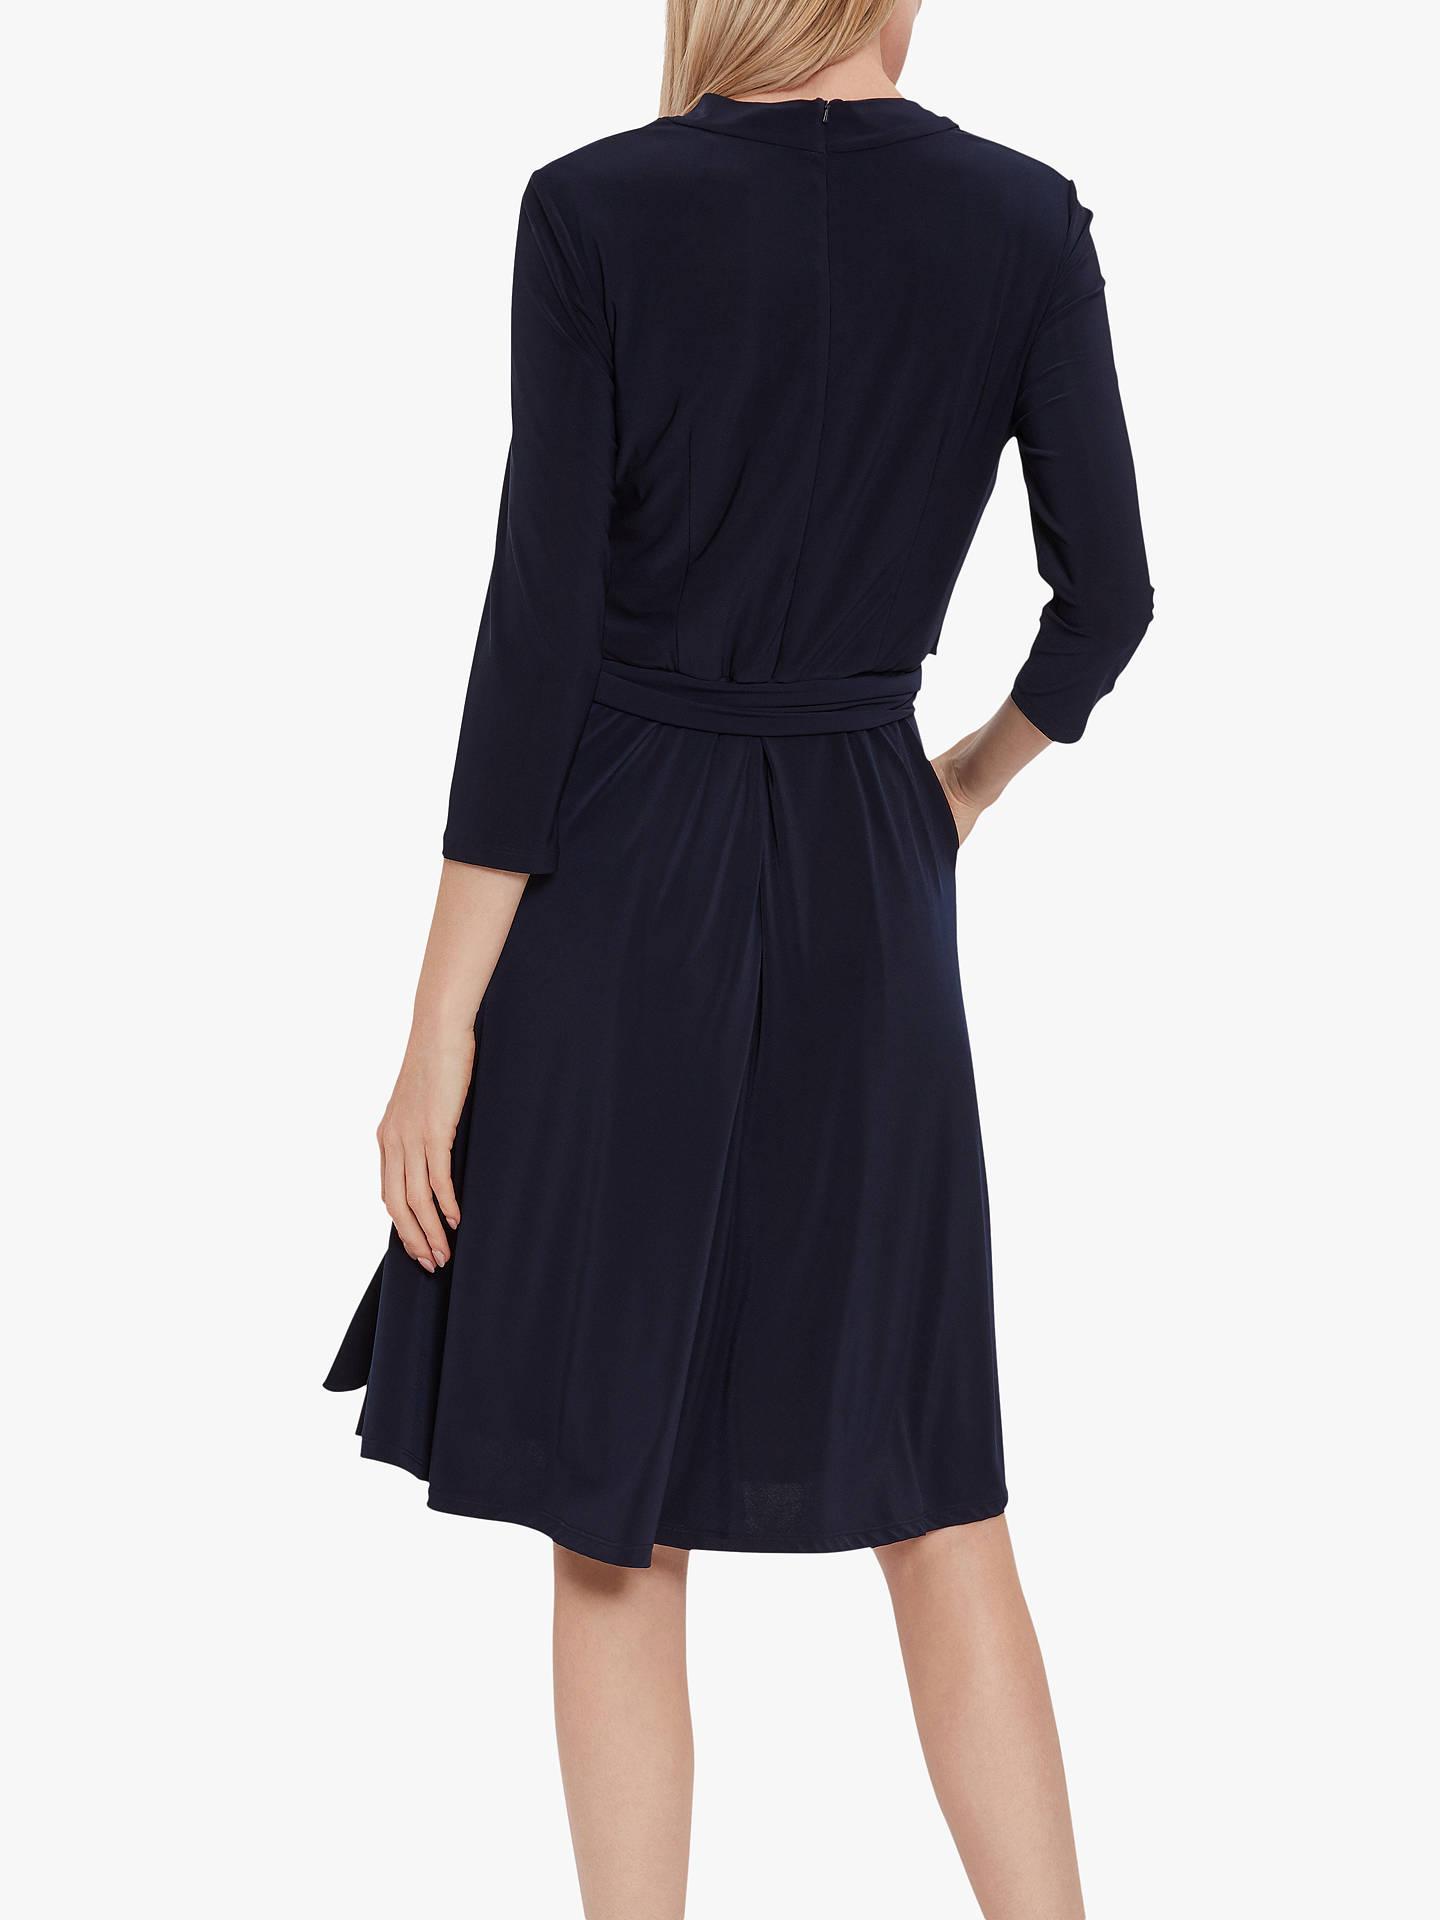 26817f01f7 Gina Bacconi Sable Jersey Dress at John Lewis   Partners